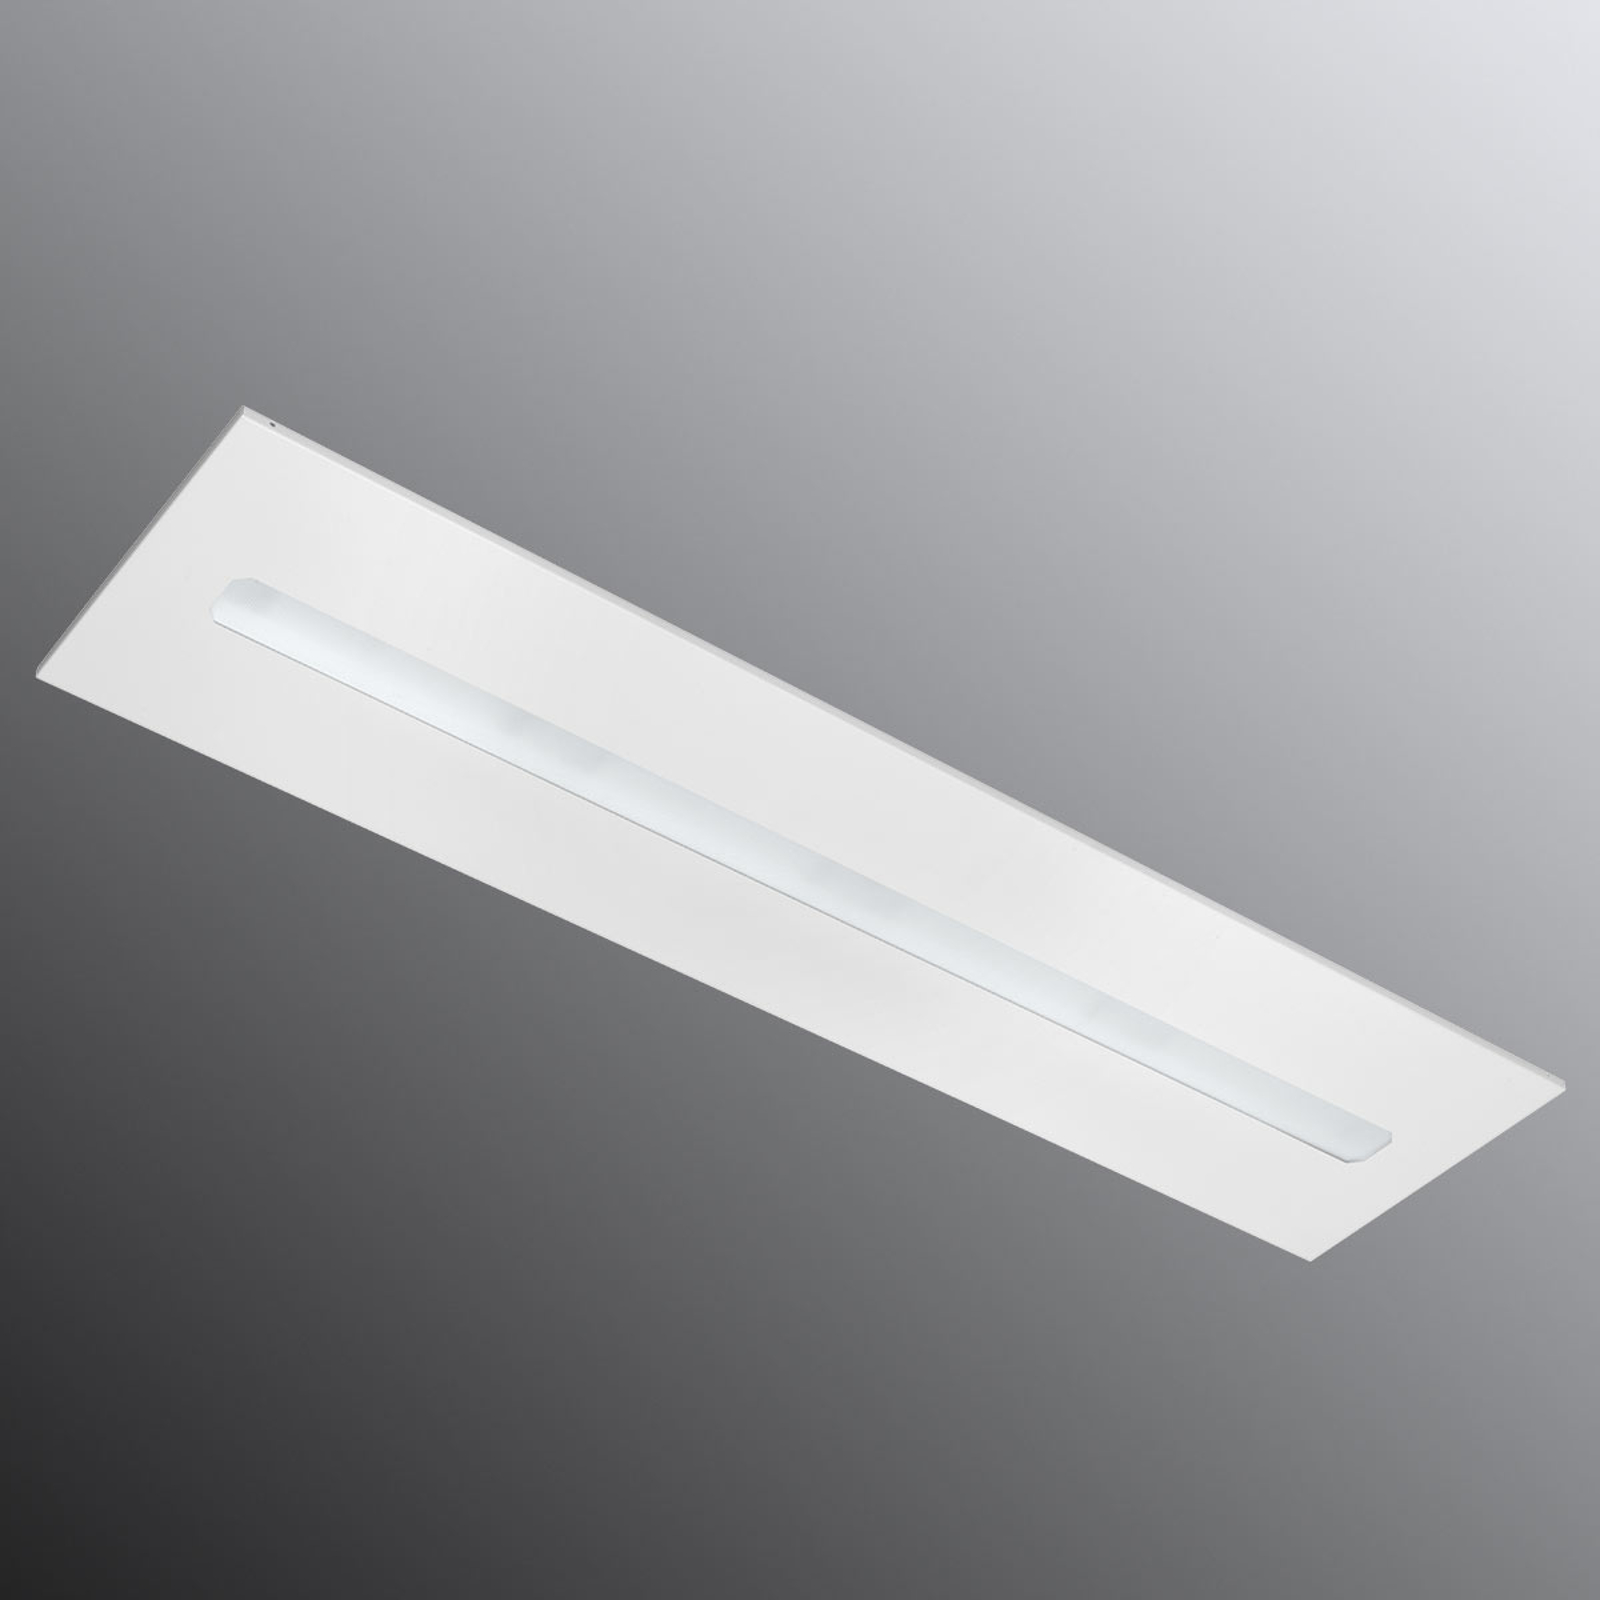 Freyn II Recessed LED-Panel 124,5 x 31cm 4.000K